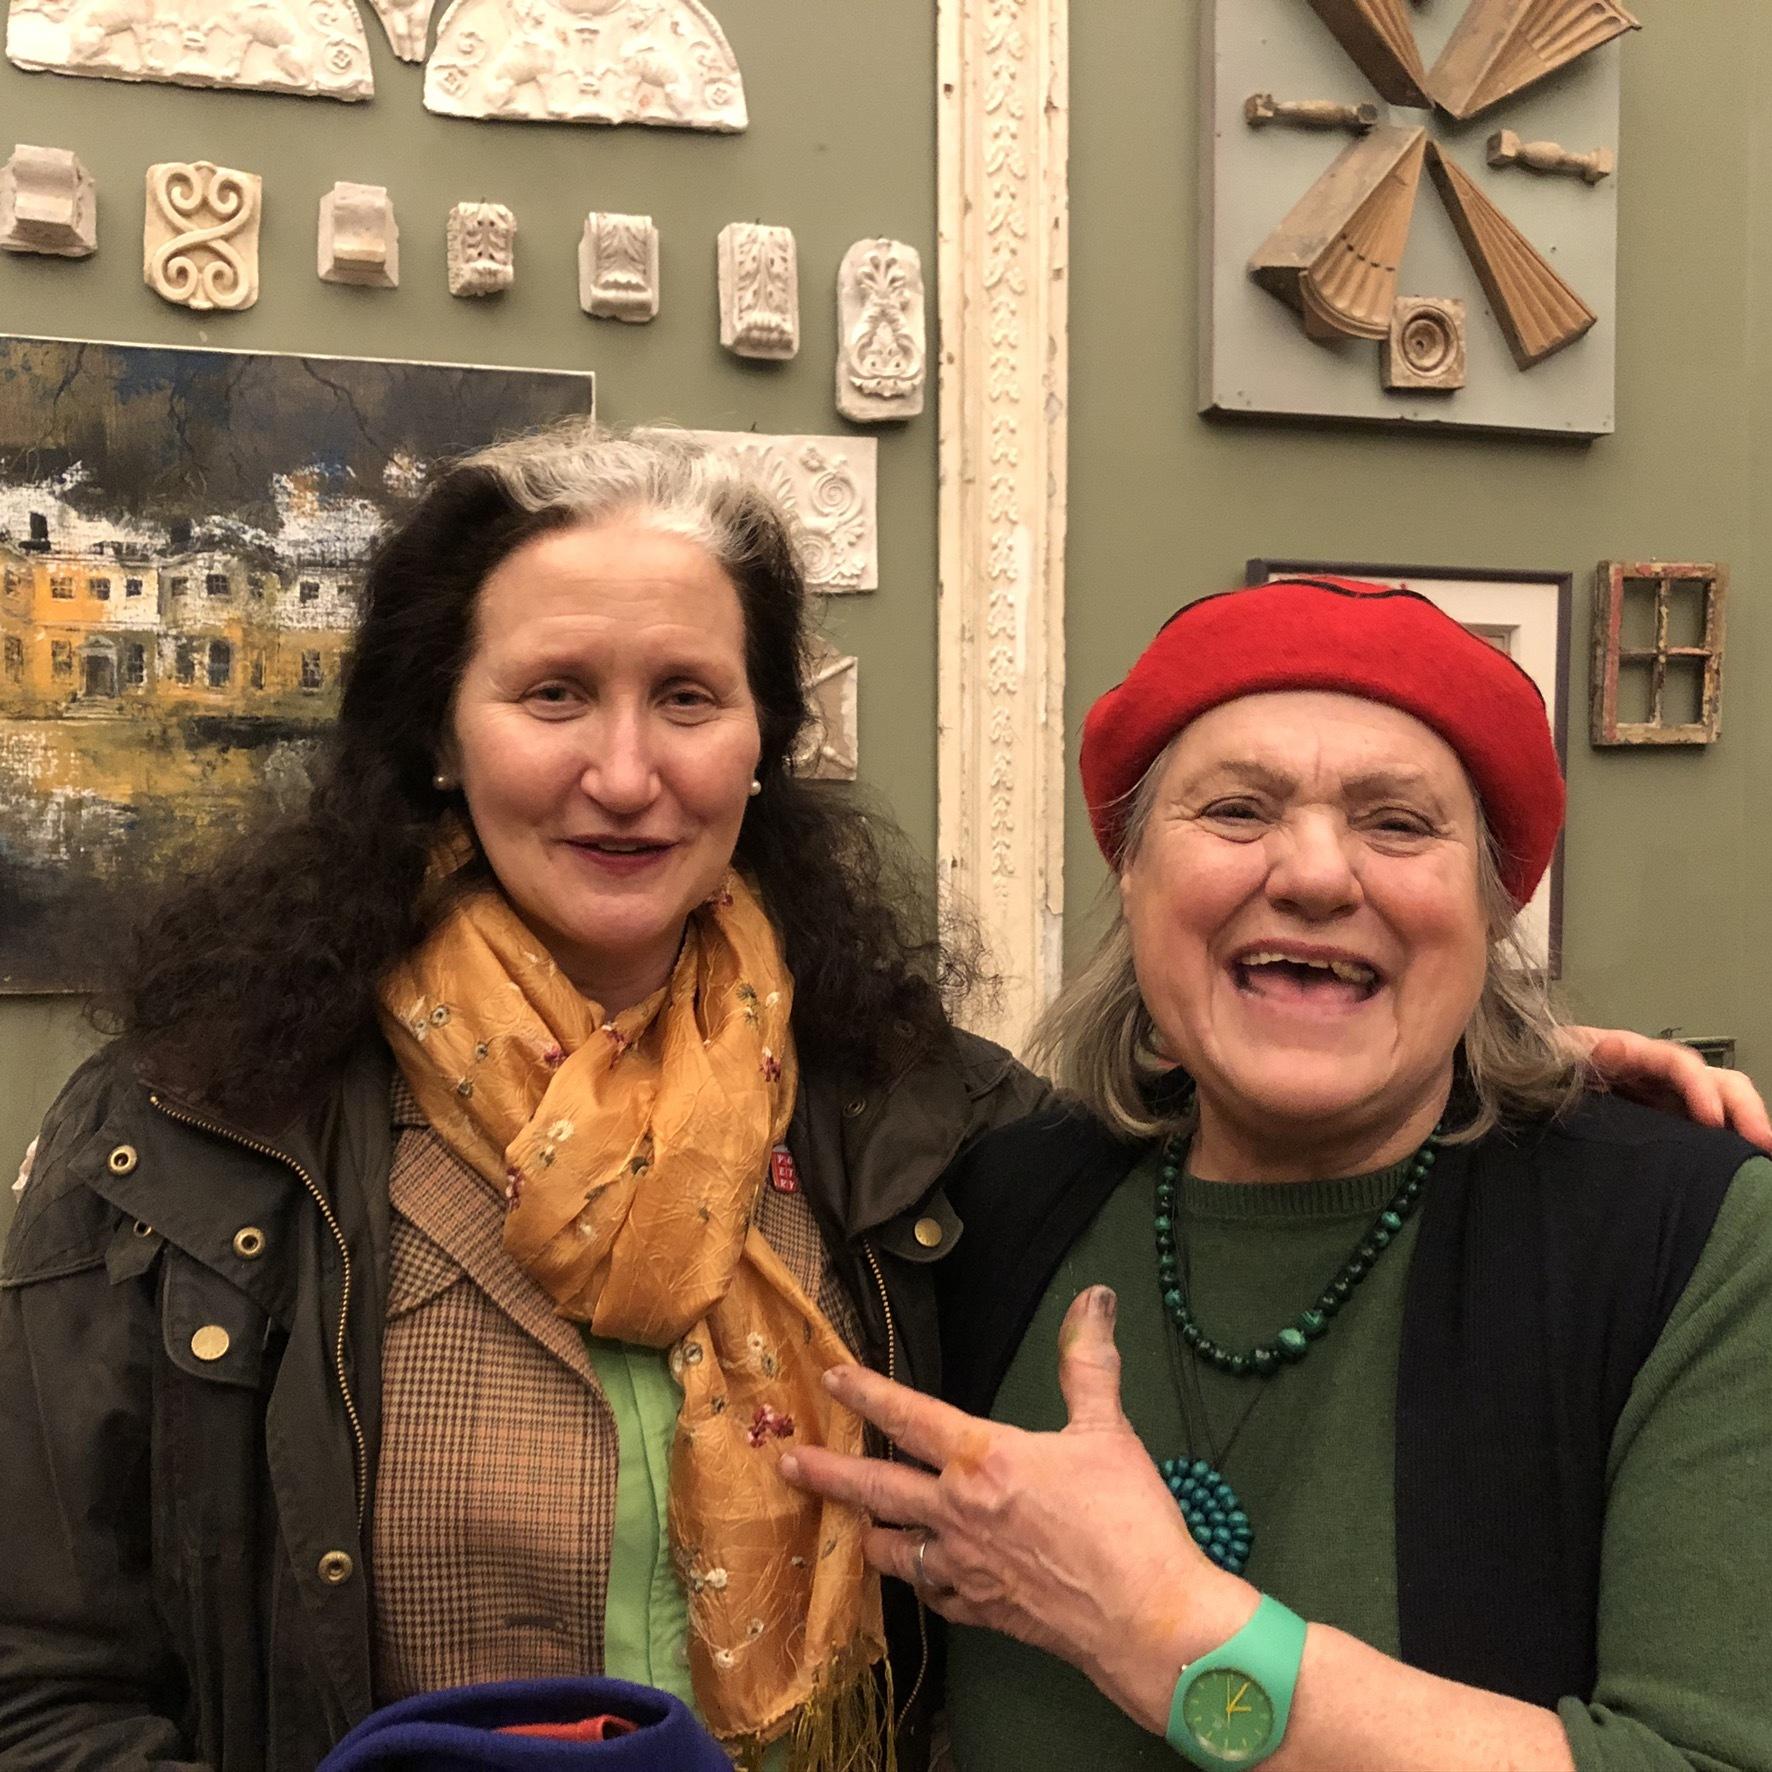 Anne-Fitzgearld-and-Carole-Cullen.JPEG#asset:13491